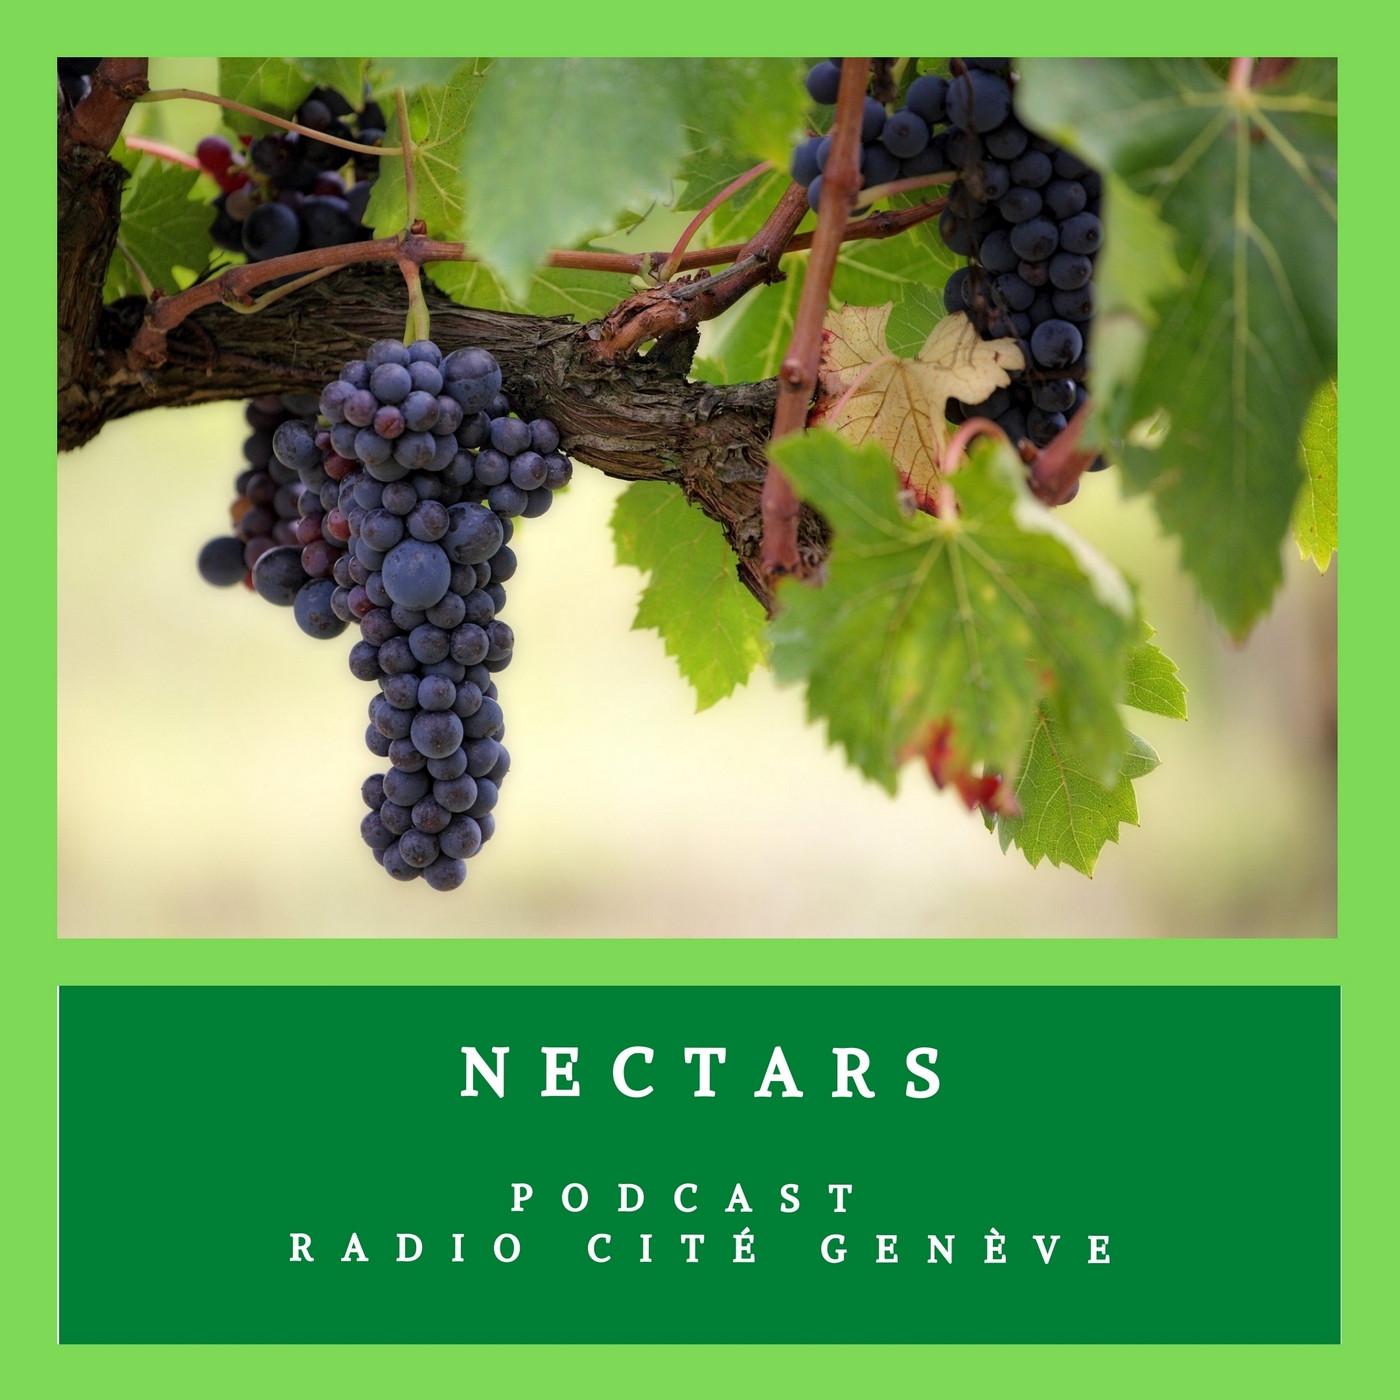 Nectars